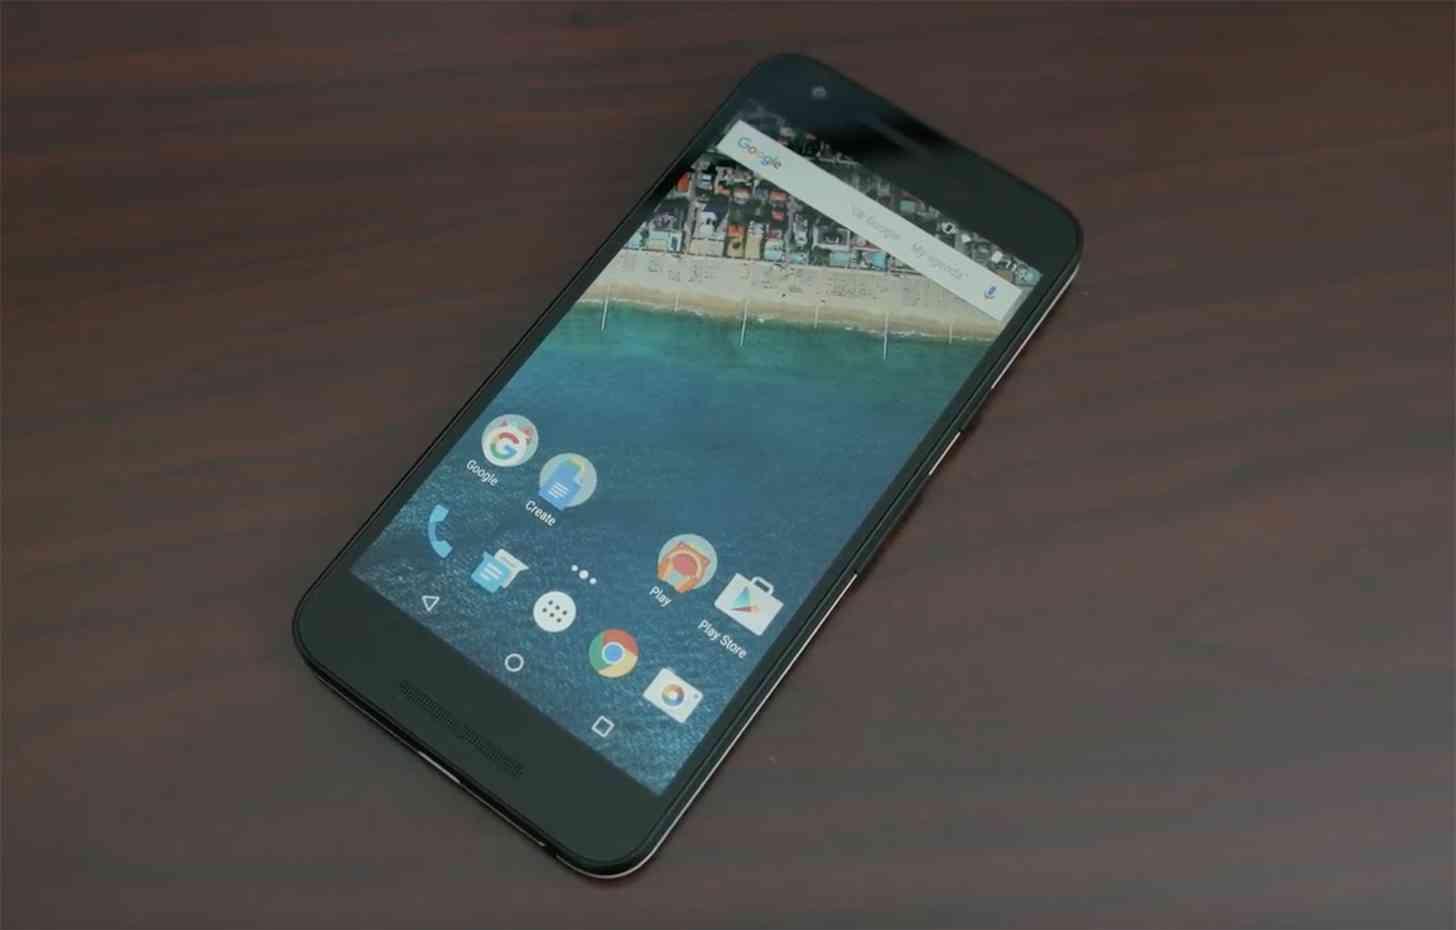 LG Google Nexus 5X review